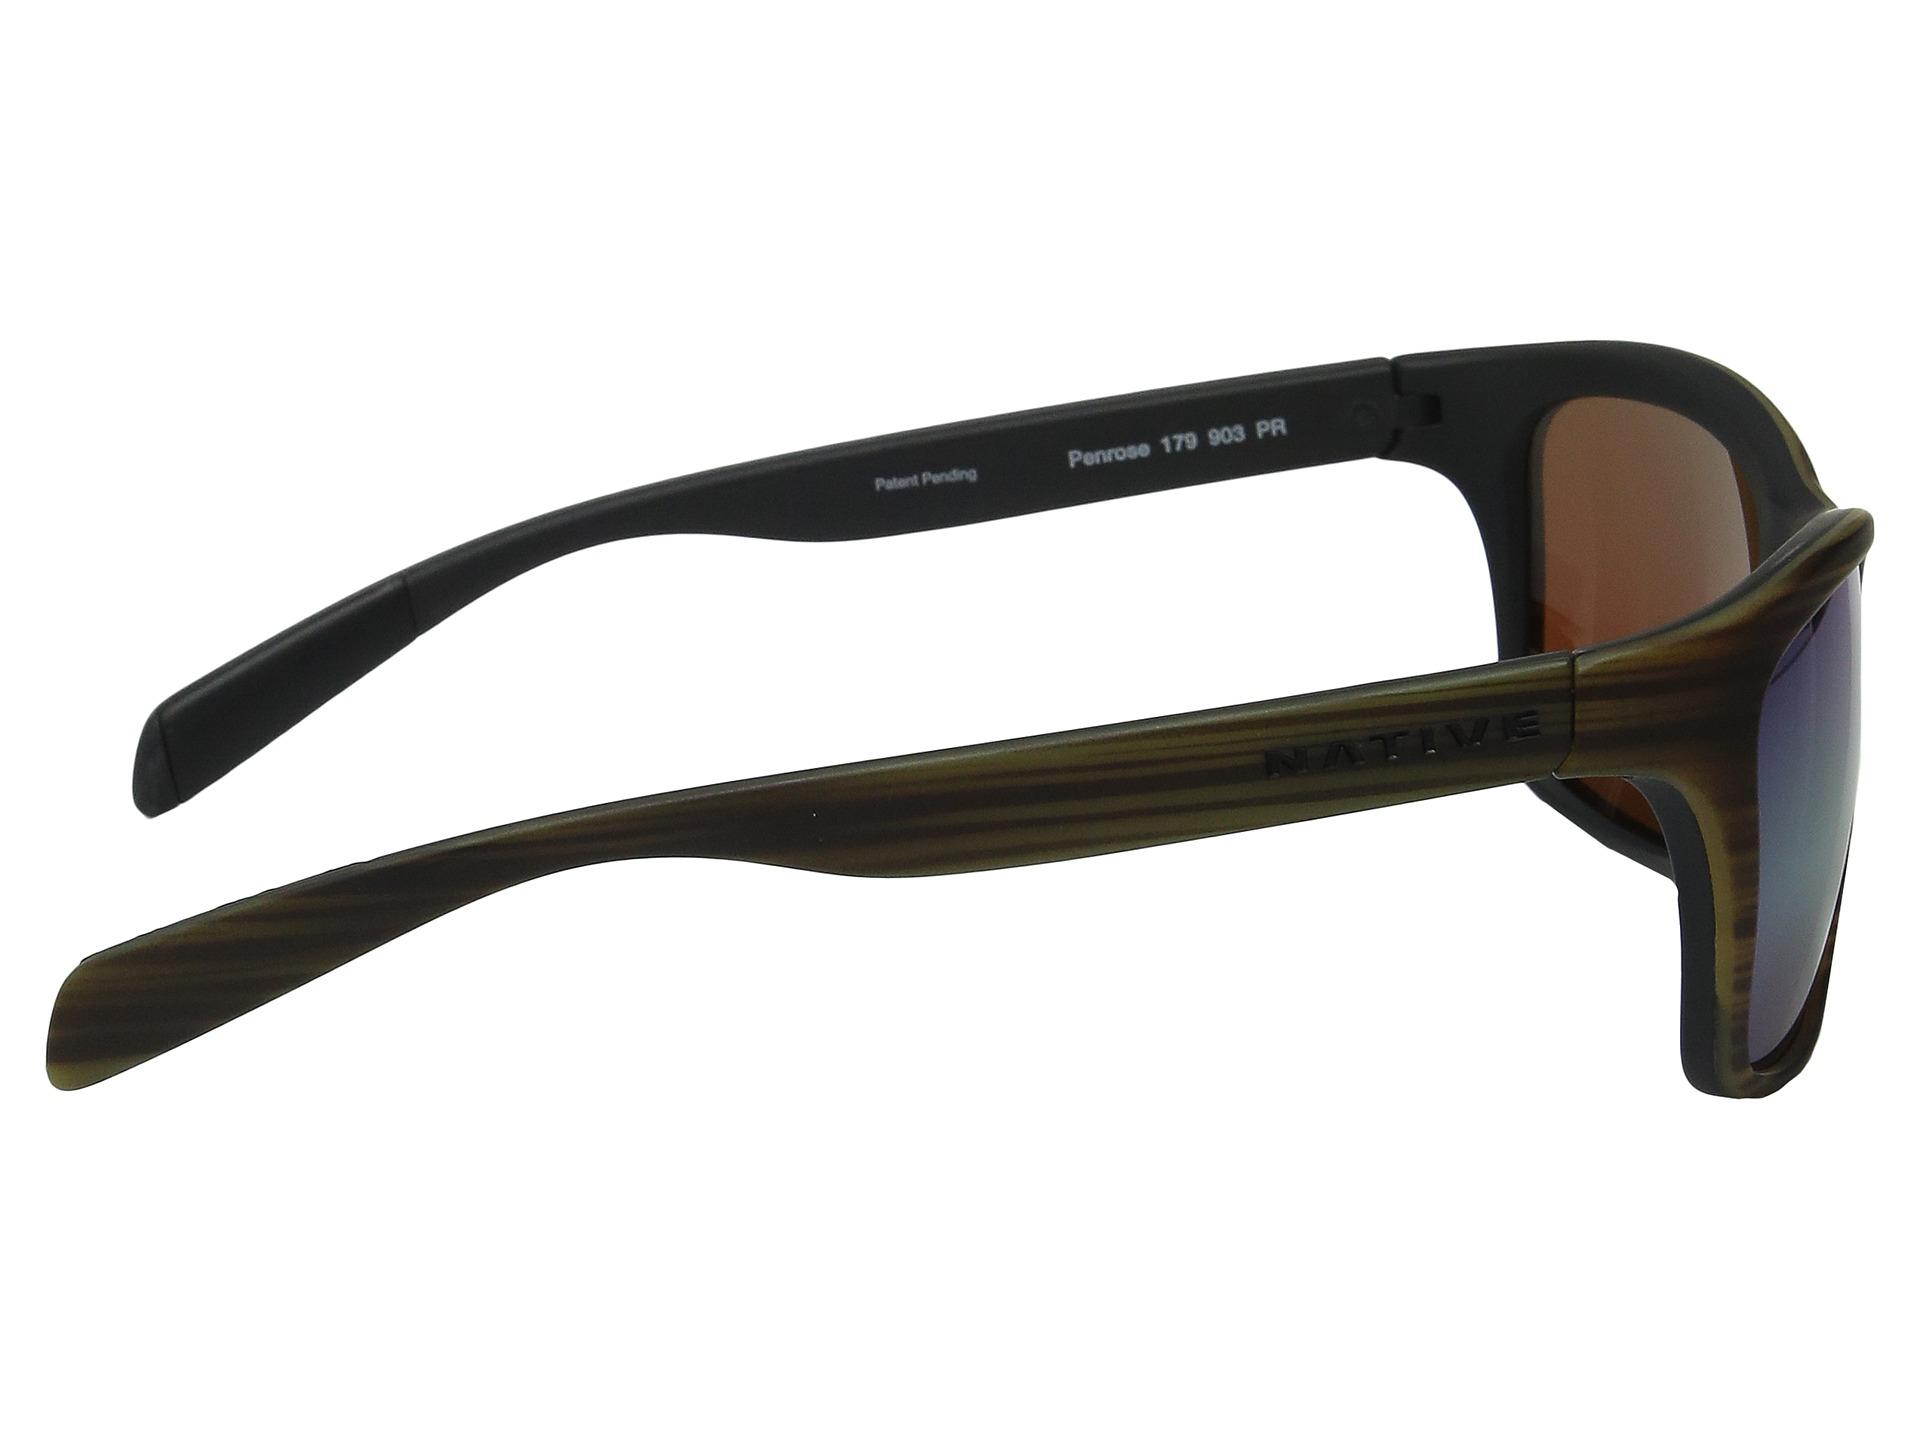 b023330523 Lyst - Native Eyewear Penrose in Black for Men